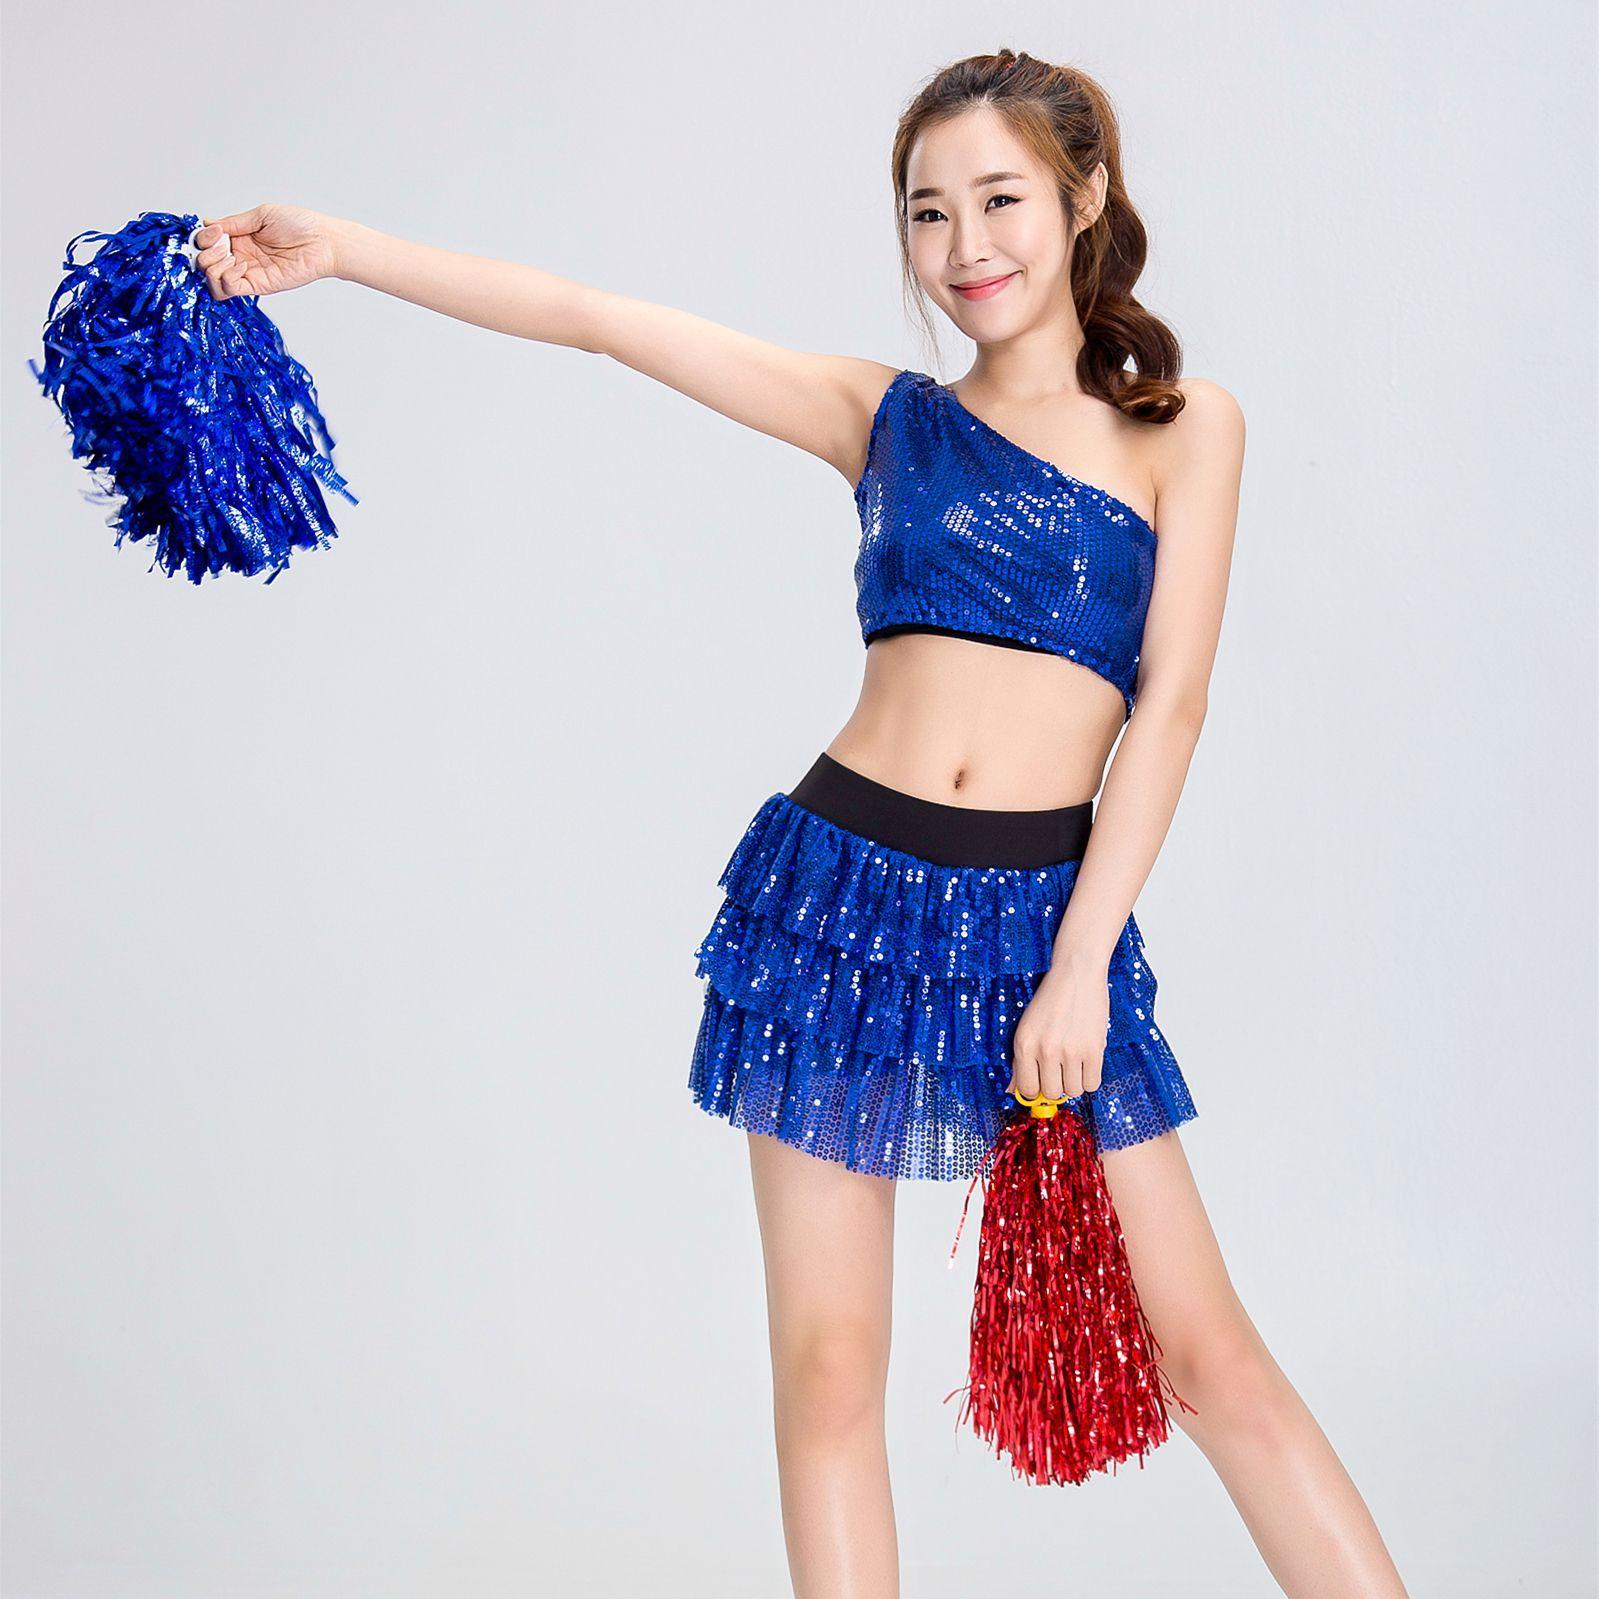 Arobic Cheer Leader Outfits College Cosplay Costume High School Girls Exotic School Cheerleading Uniform Cosplay High School Col